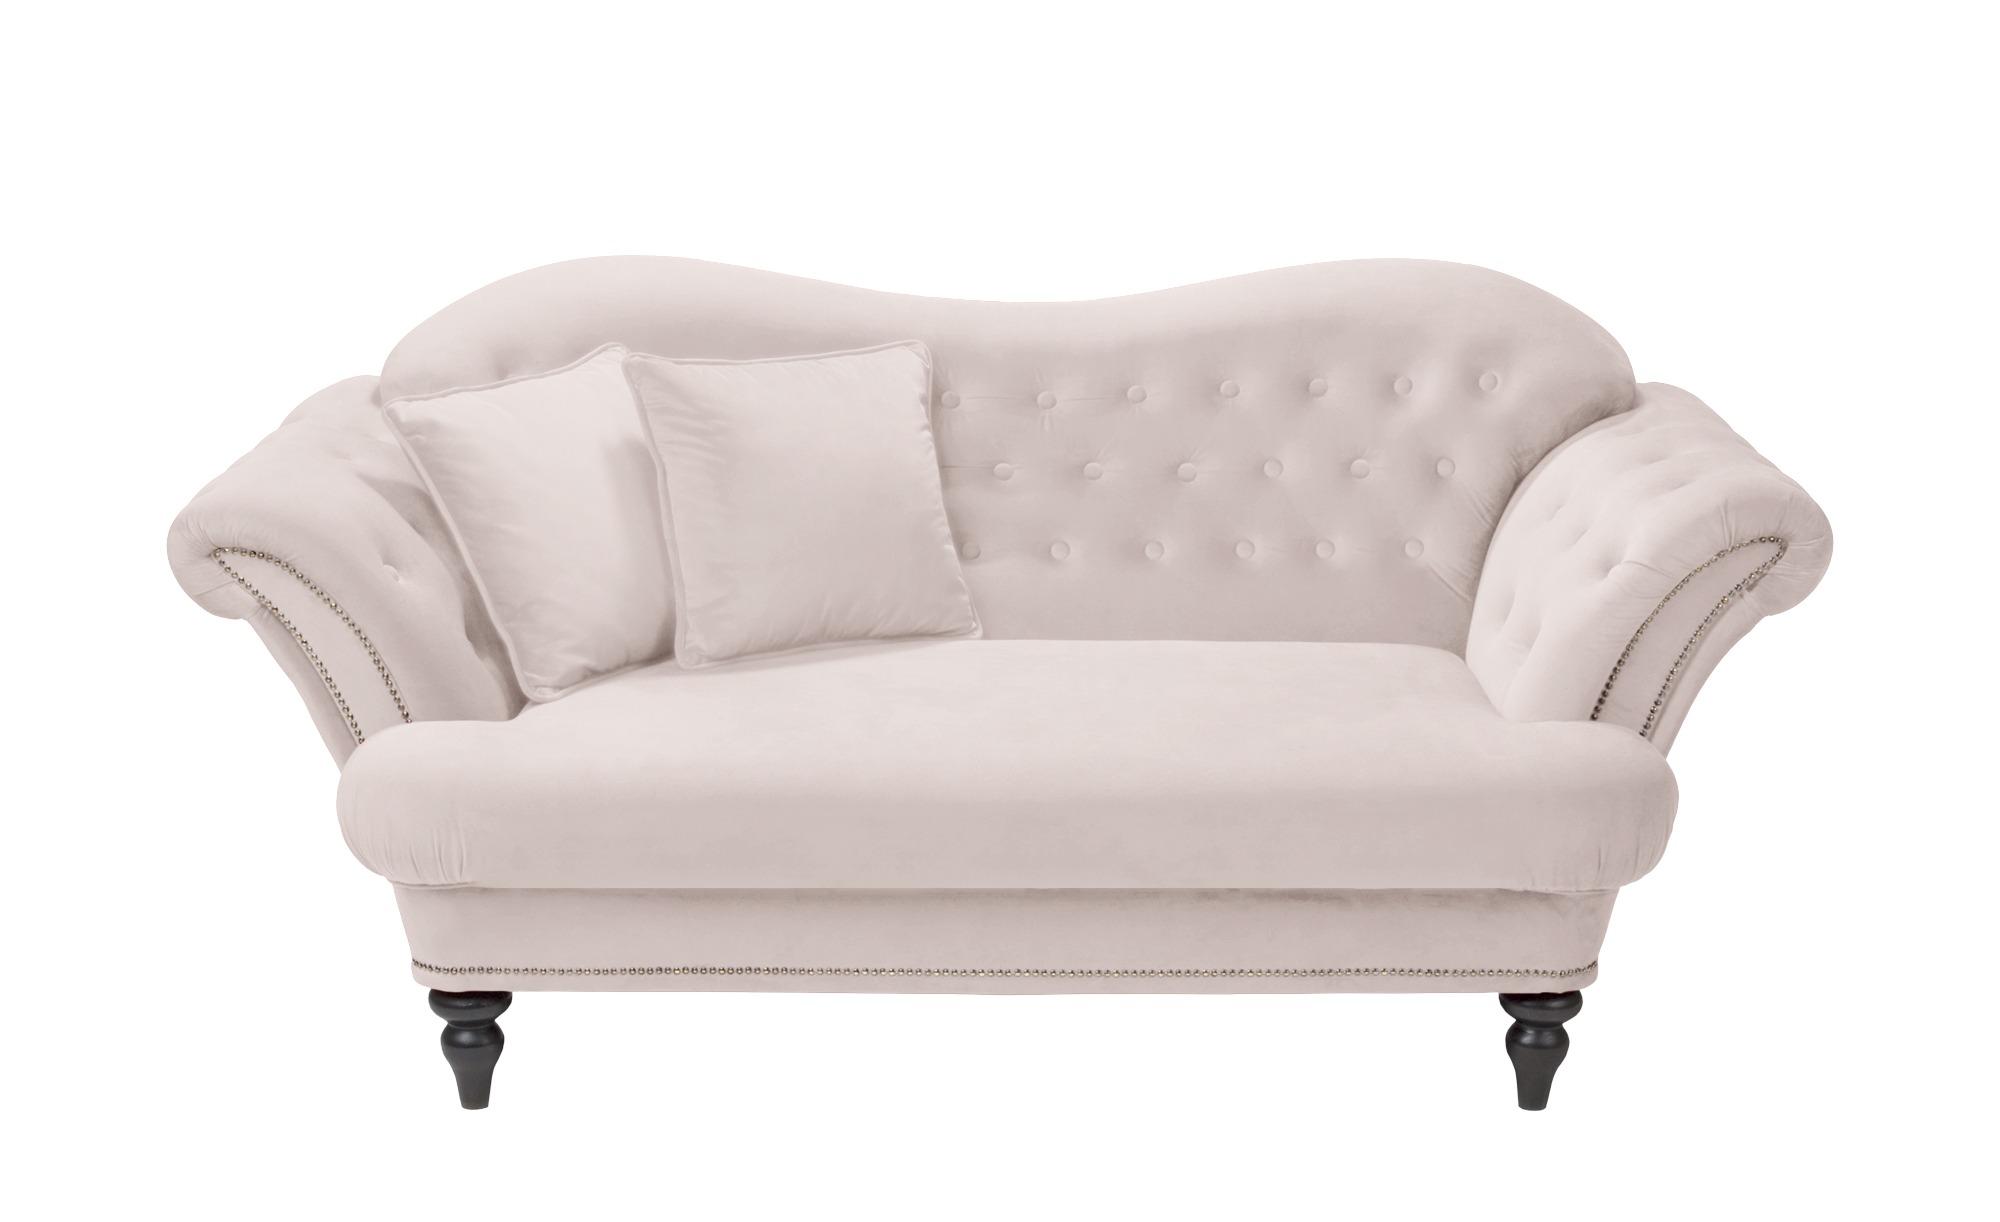 smart sofa designs leopard print uk sissi breite 203 cm höhe 96 rosa pink